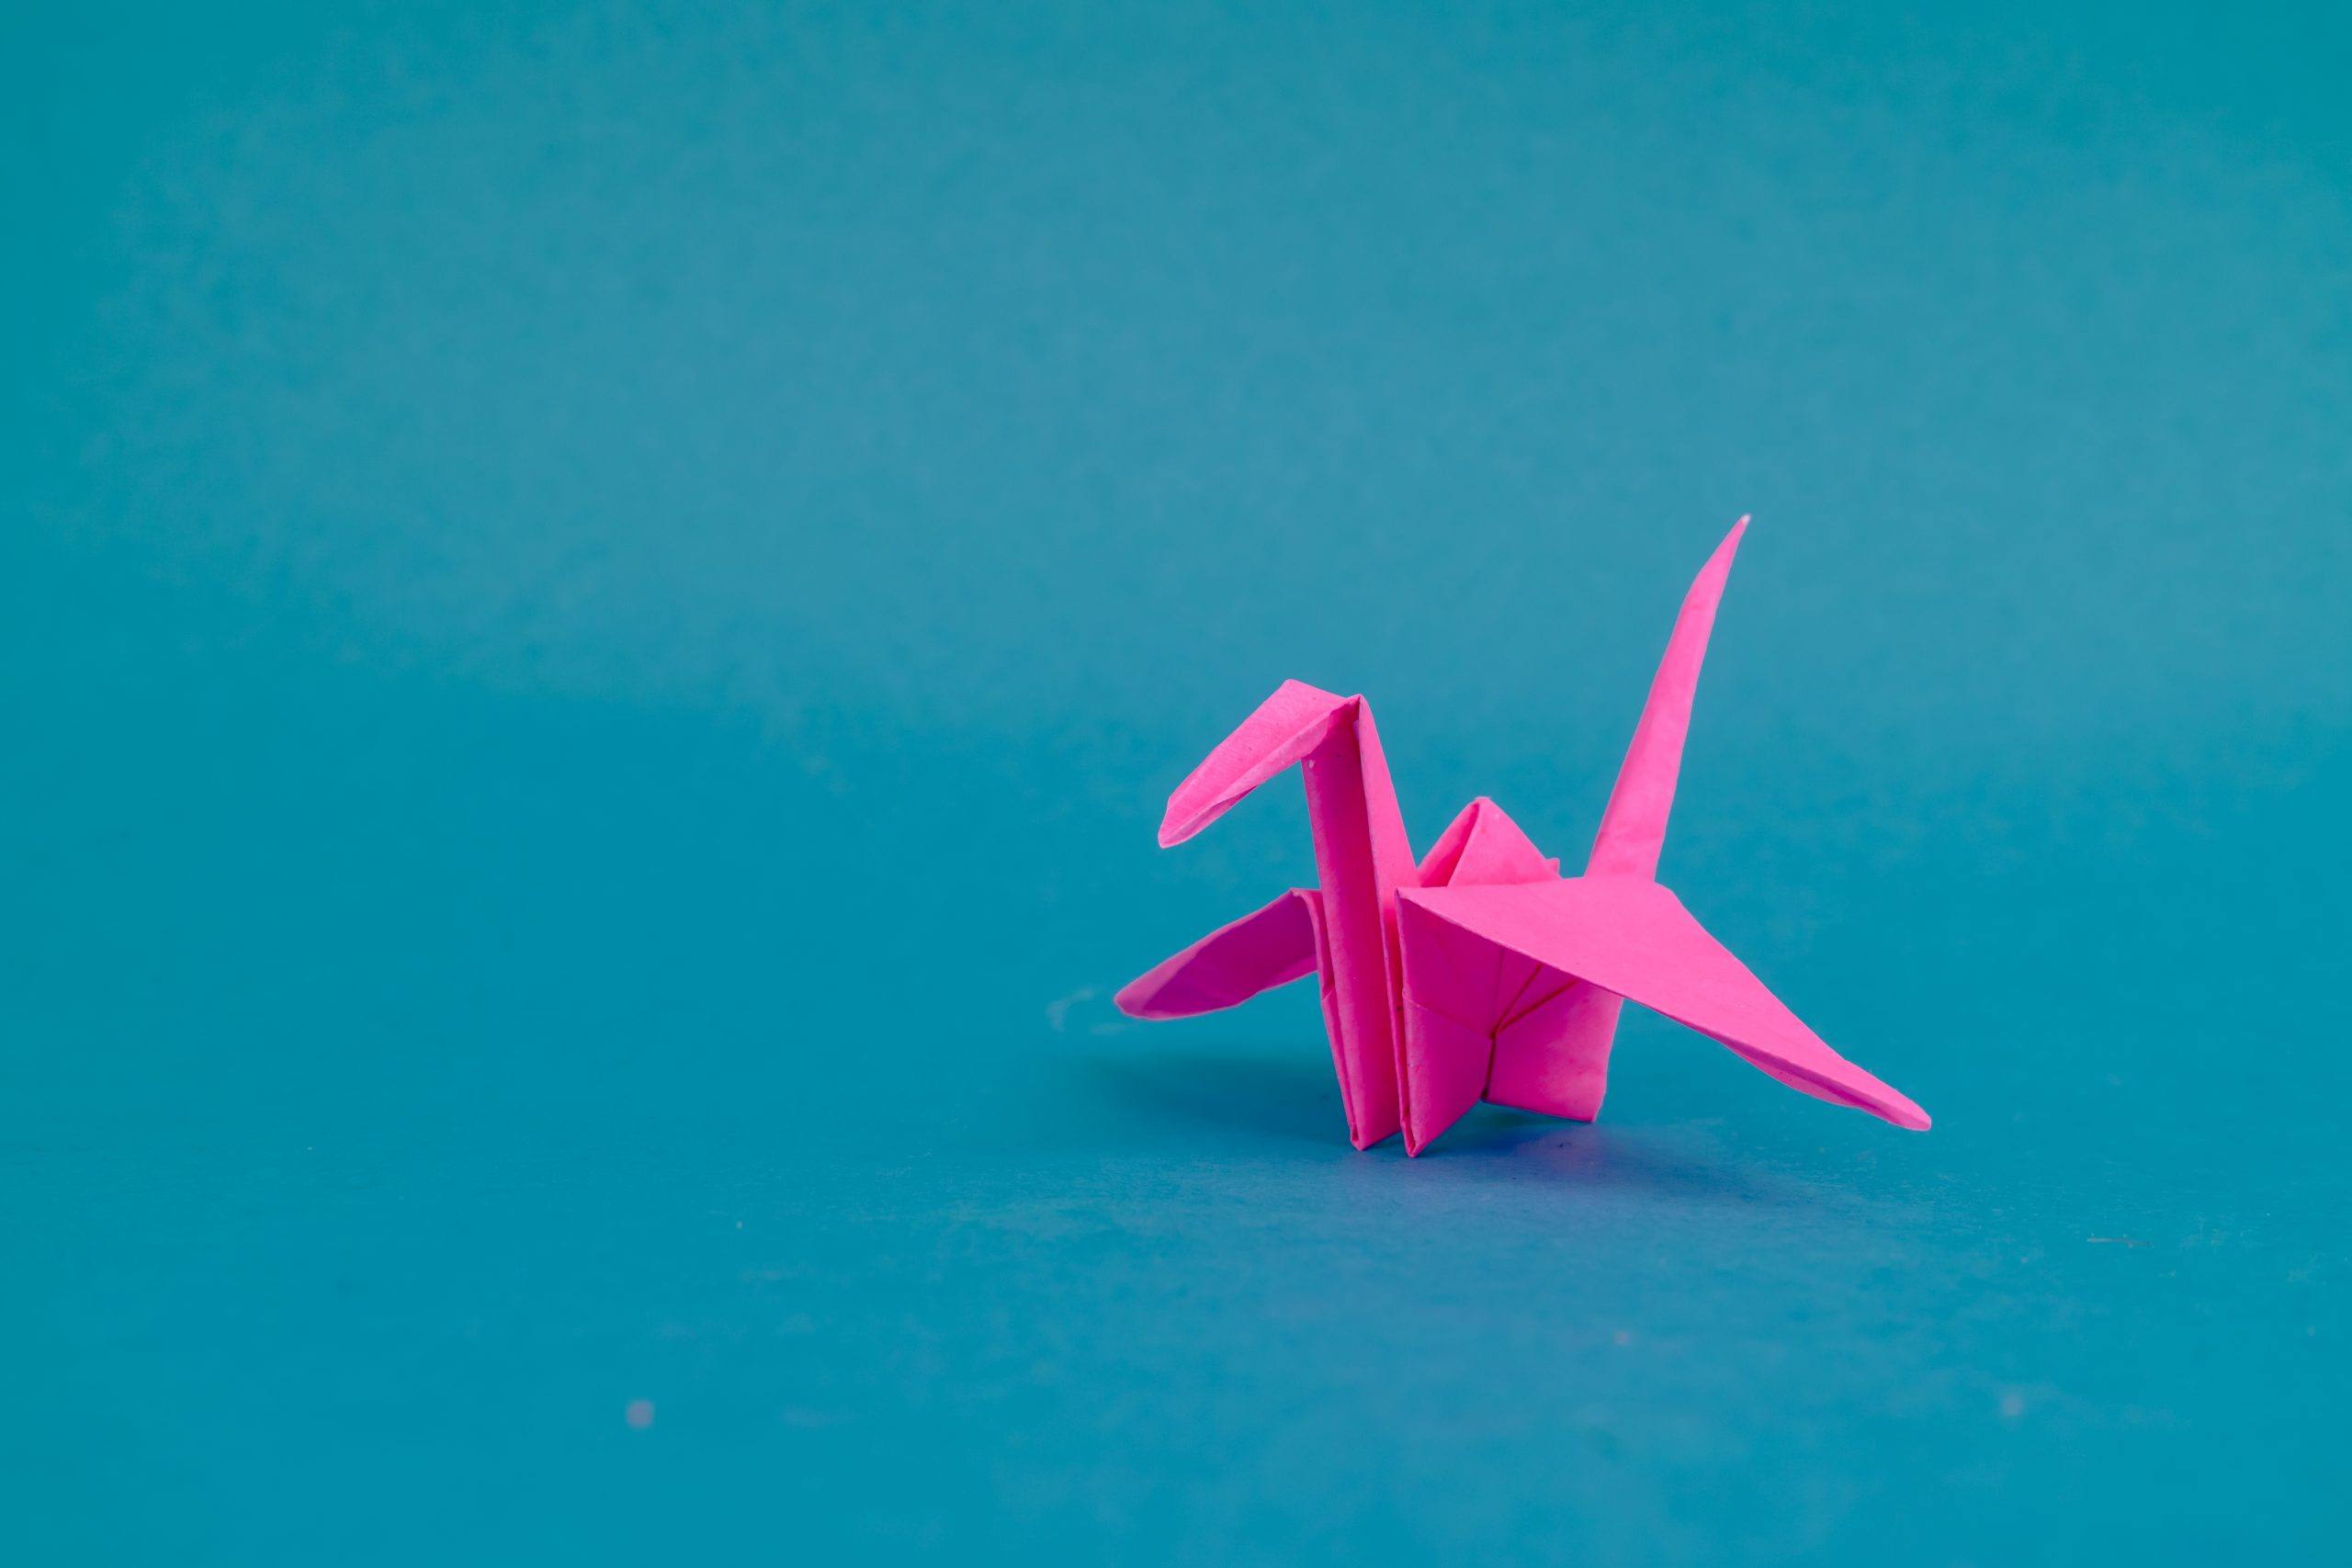 Pink crane origami